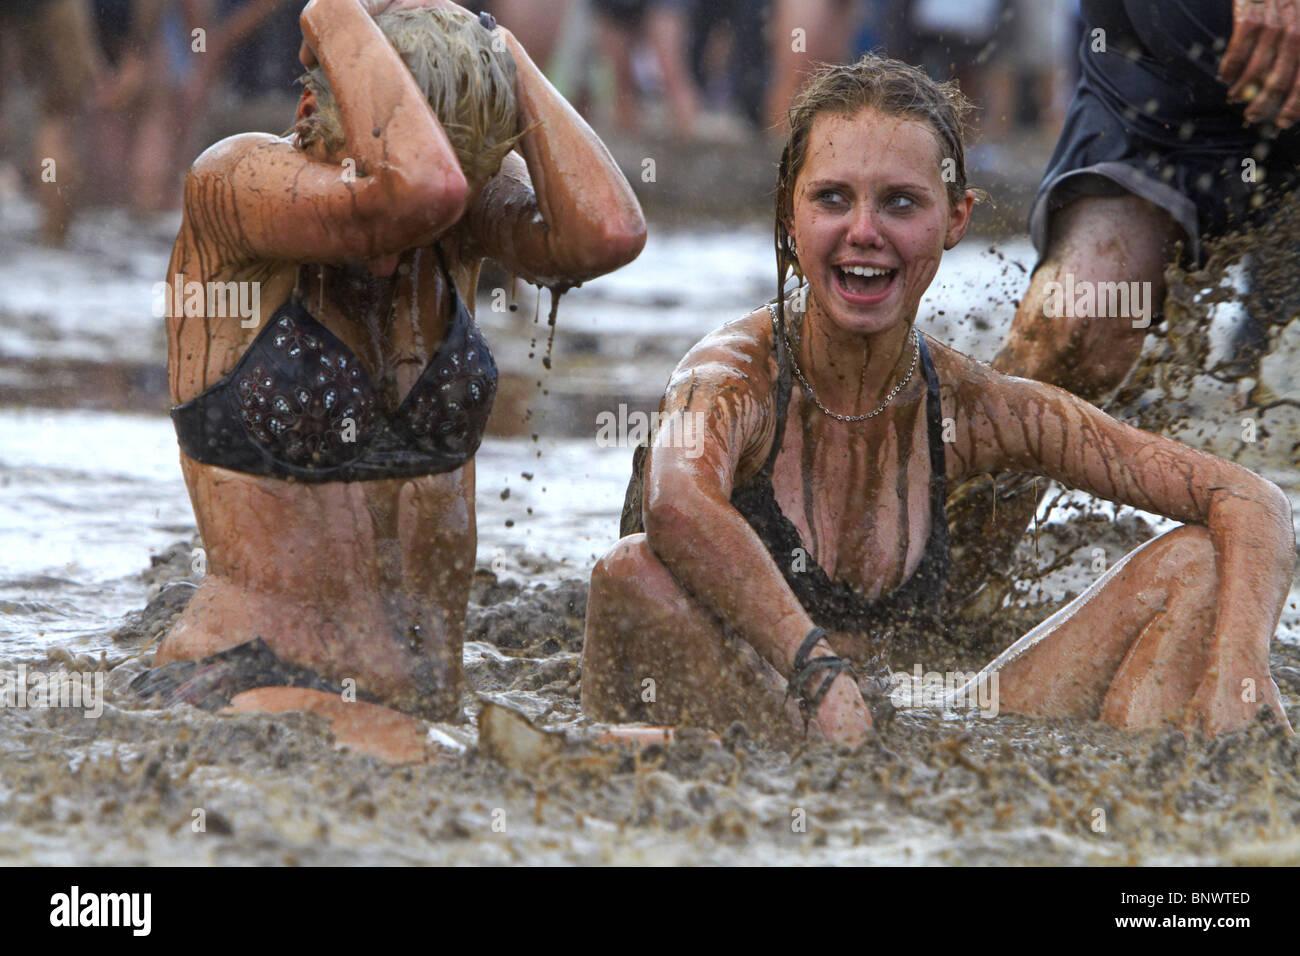 Przystanek Woodstock - al aire libre más grande de Europa festival en Kostrzyn, Polonia Imagen De Stock